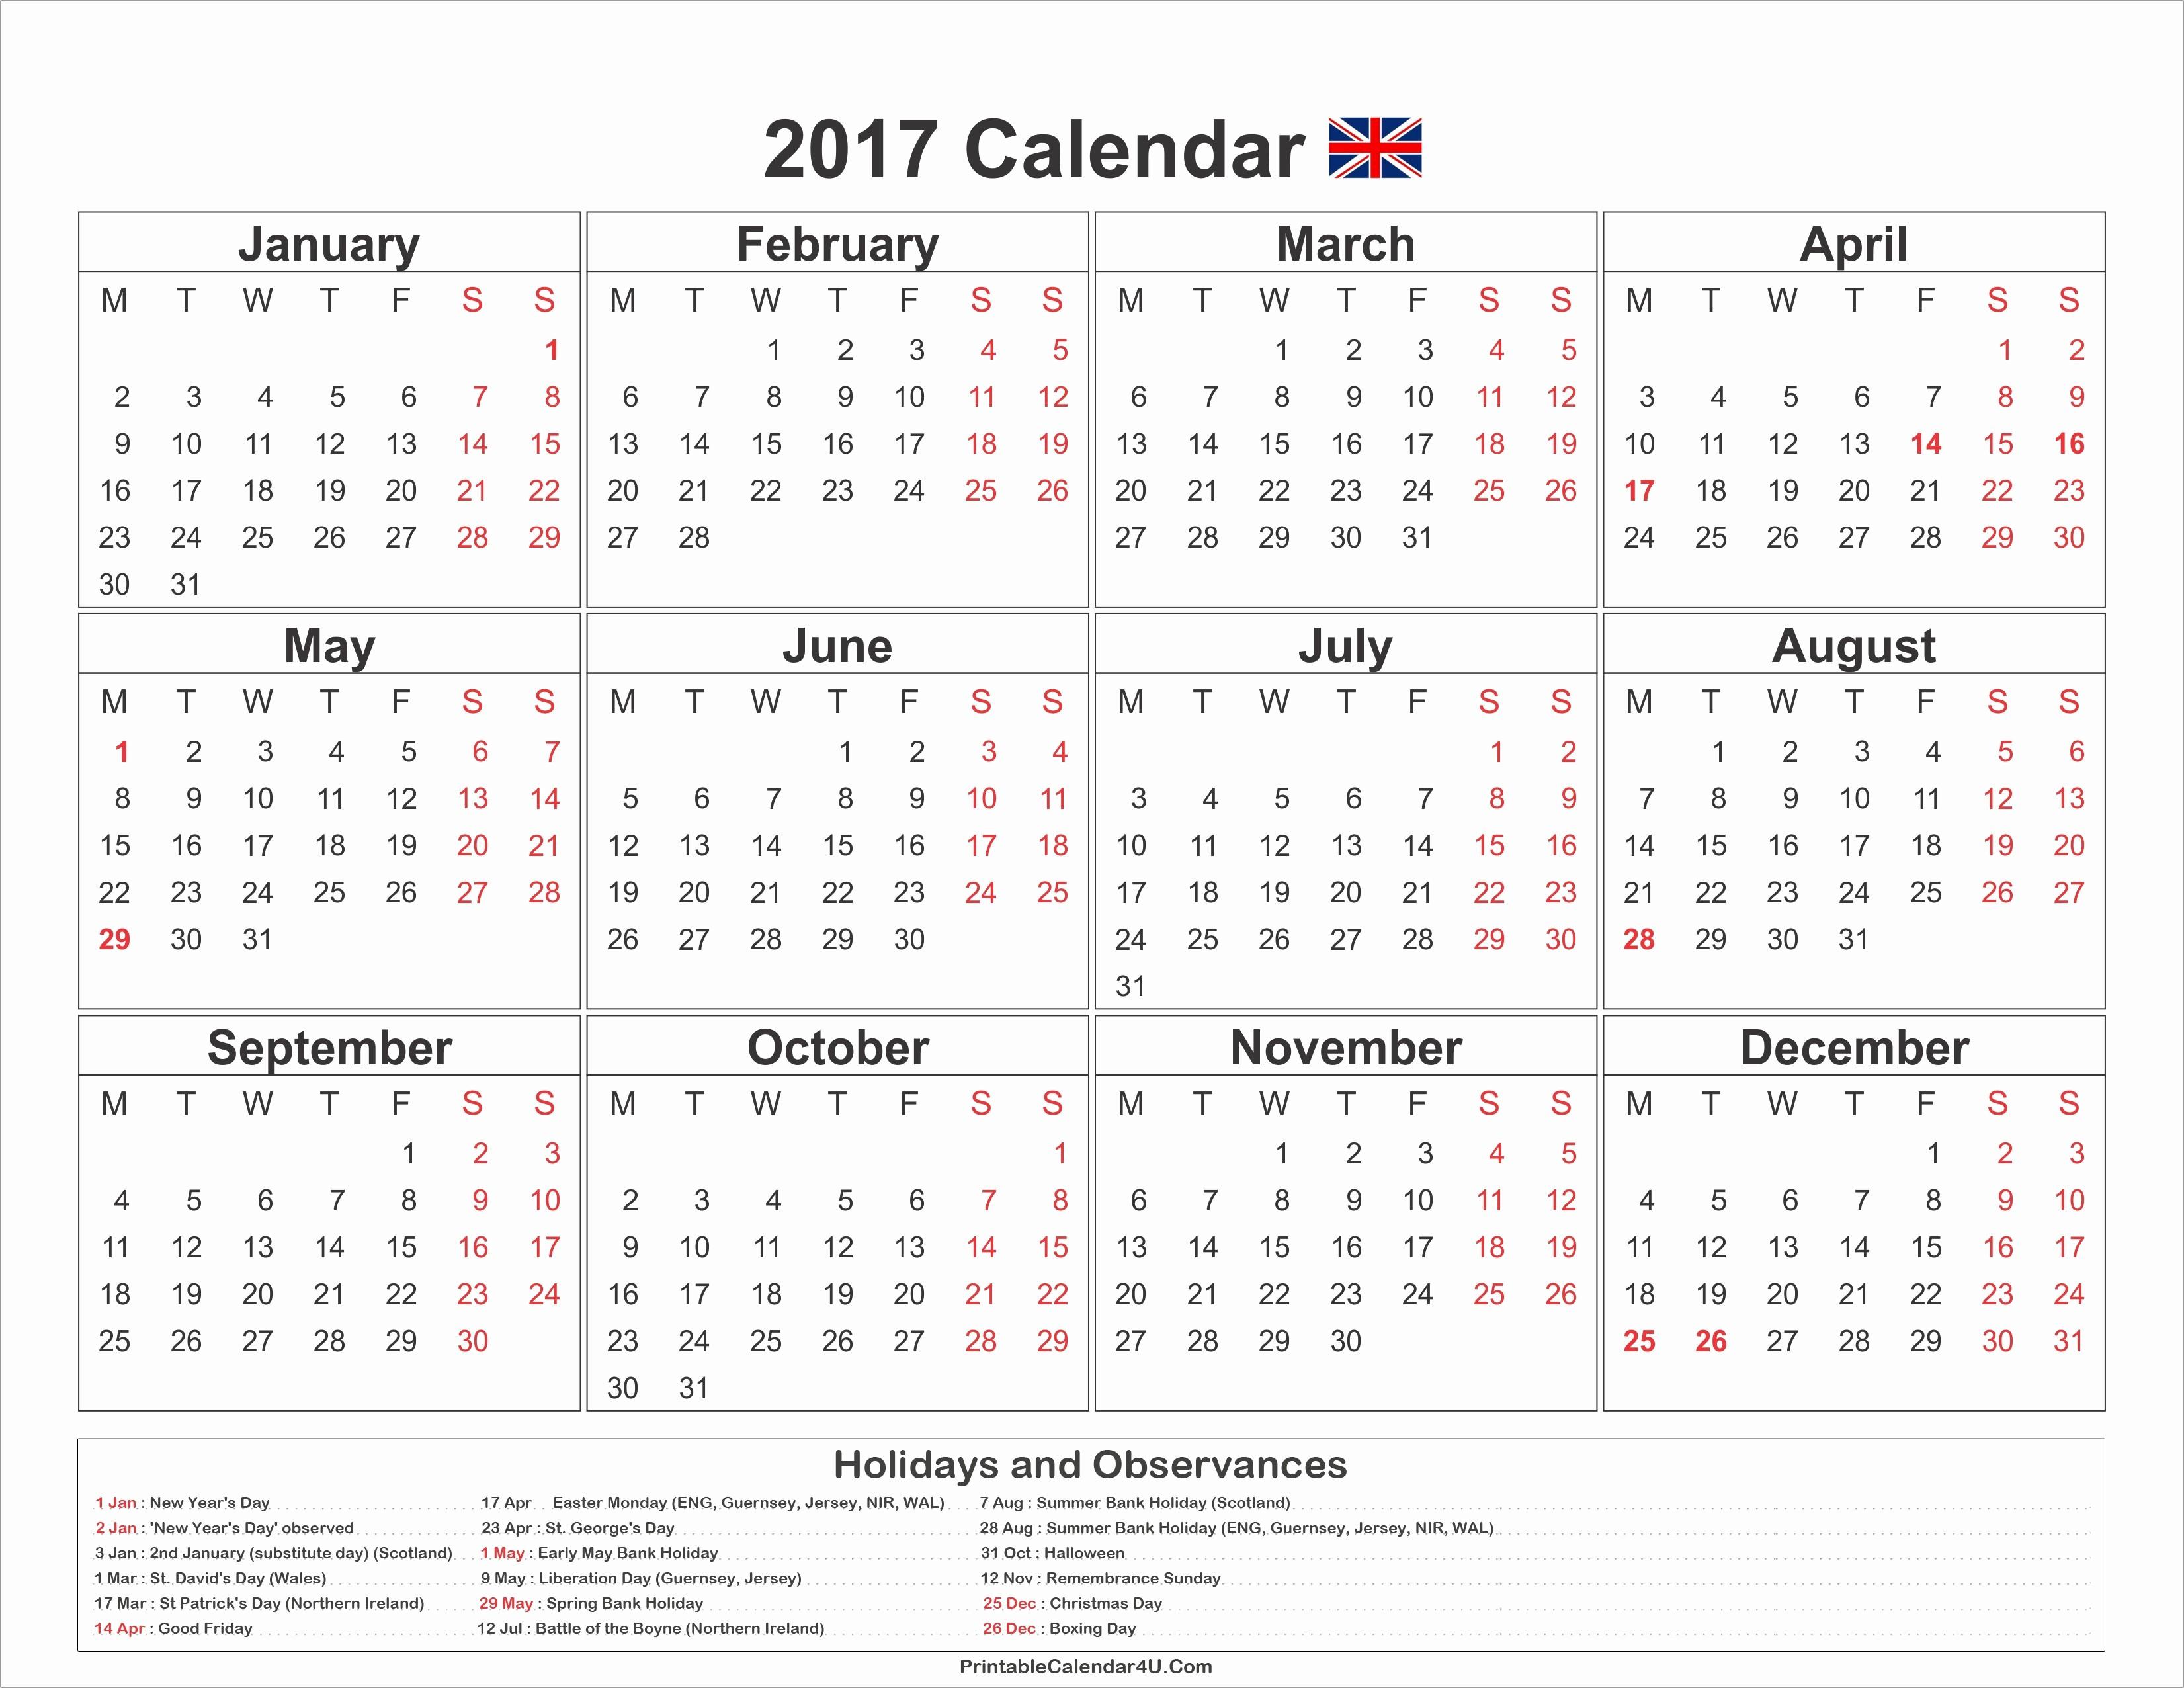 Excel Calendar 2017 with Holidays Elegant Information or Calendar 2019 Uk Bank Holidays Calendar